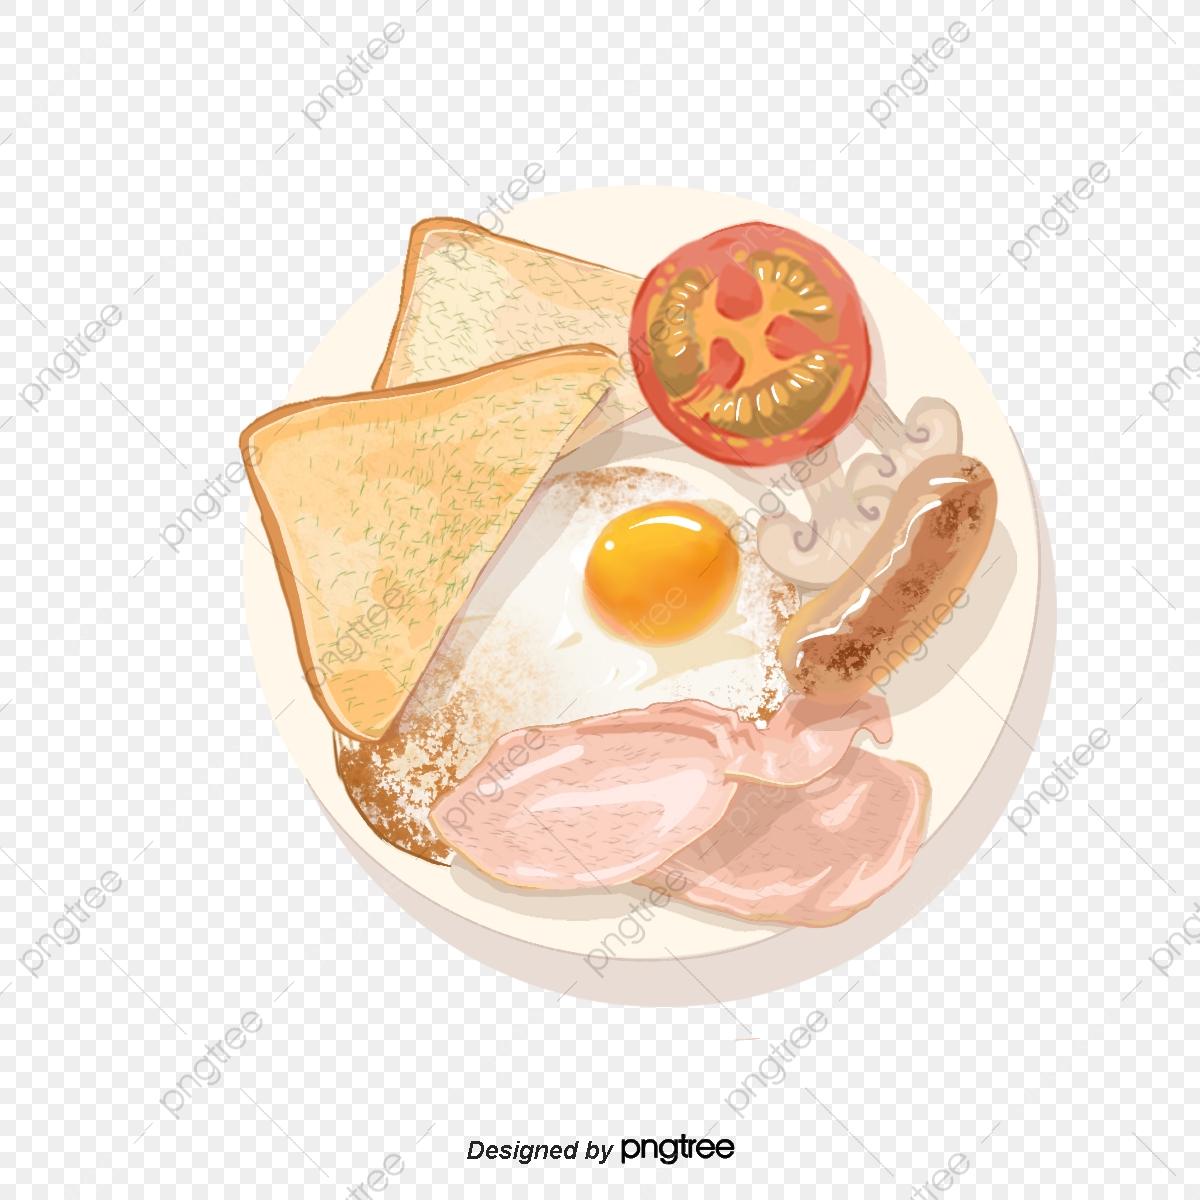 Breakfast, Omelette, Sausage, Lettuce PNG Transparent Clipart Image.